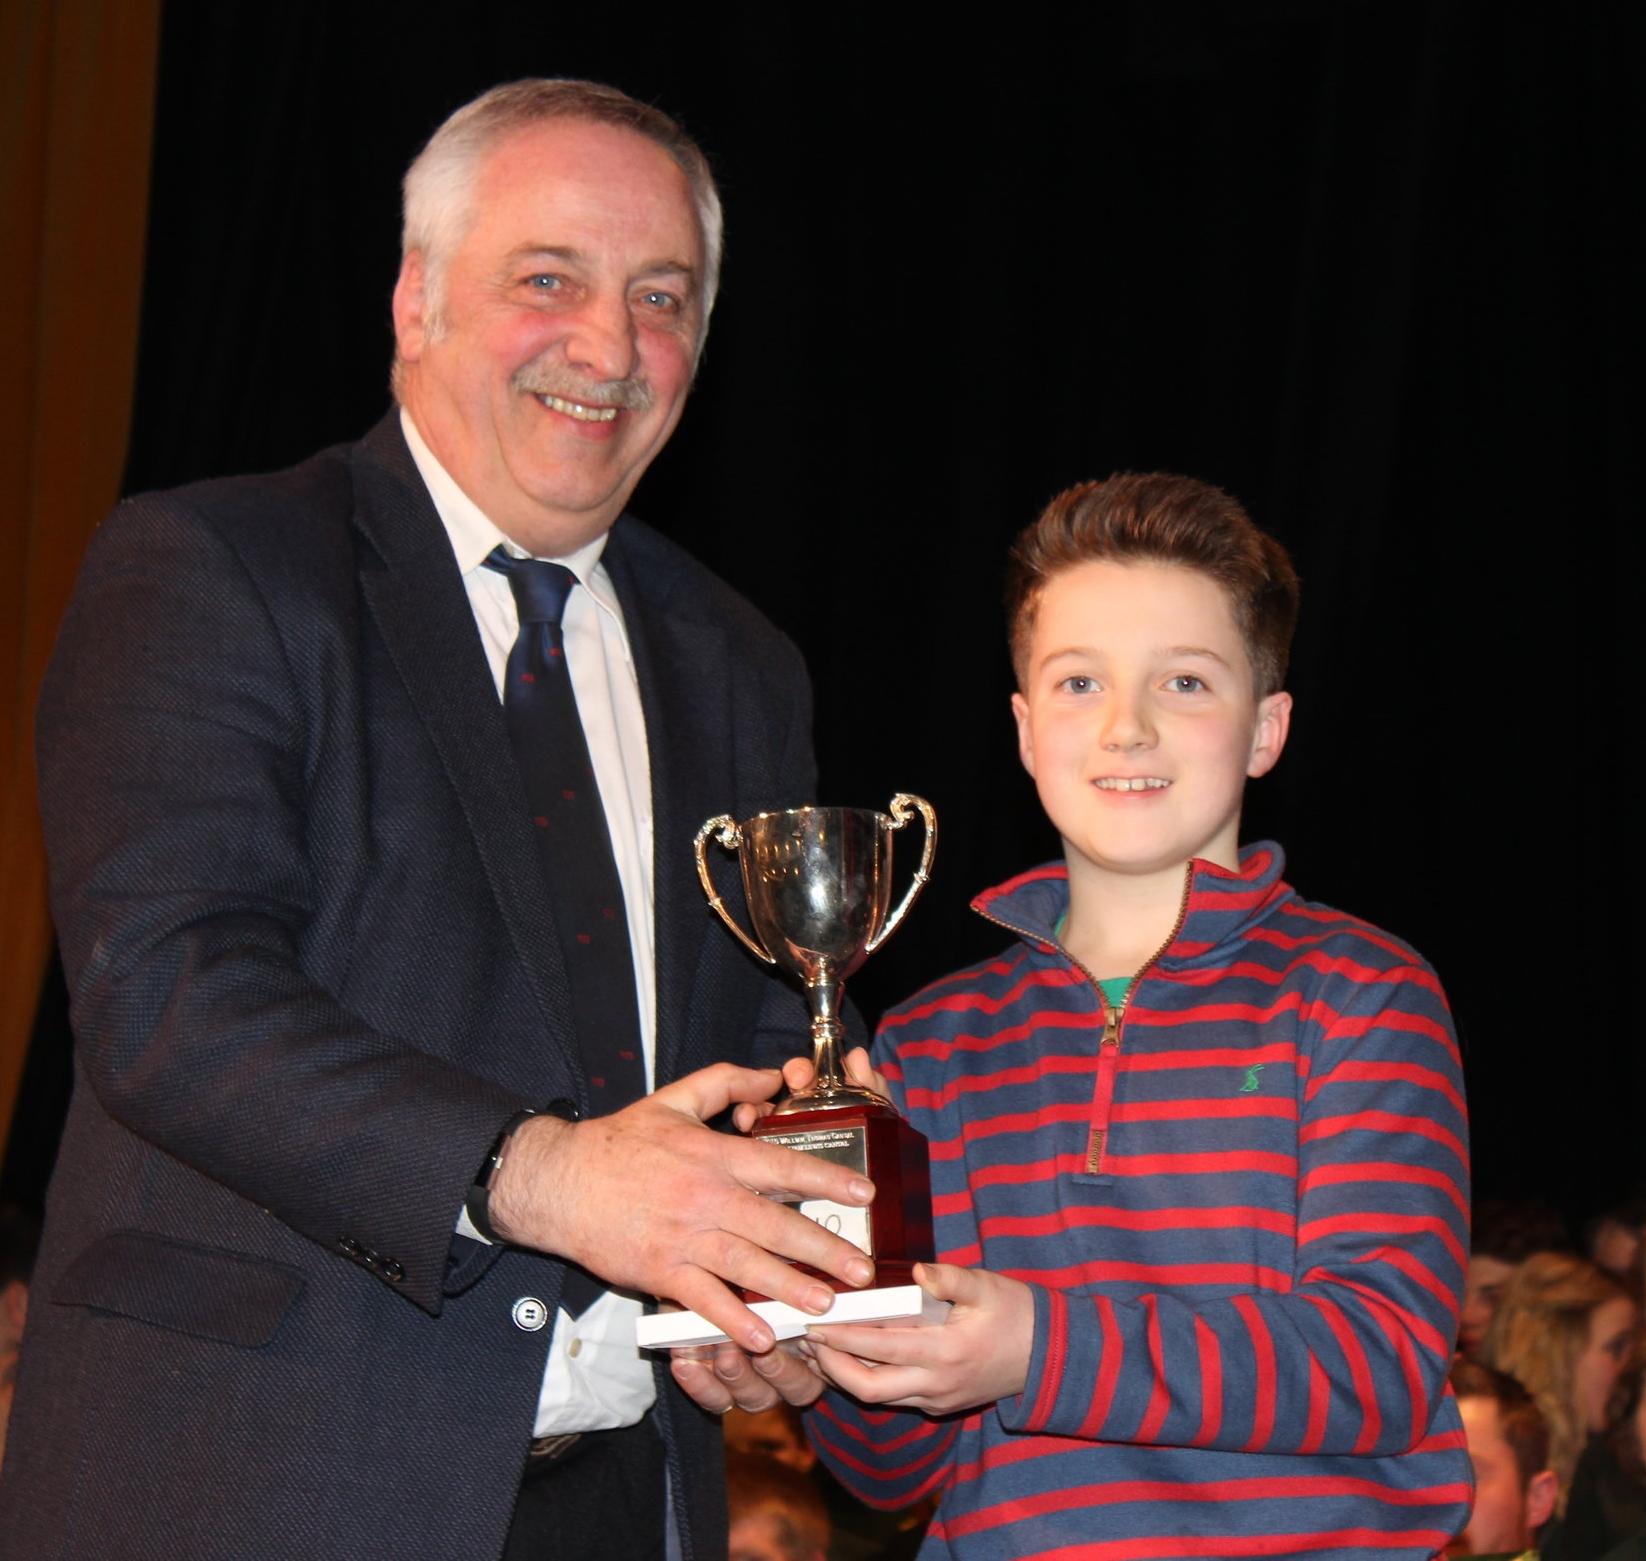 Louis Watkins, Dolau YFC winning the 'Midge Roderick Award' for best Actor under 13 years being presented by David Powell, FUW